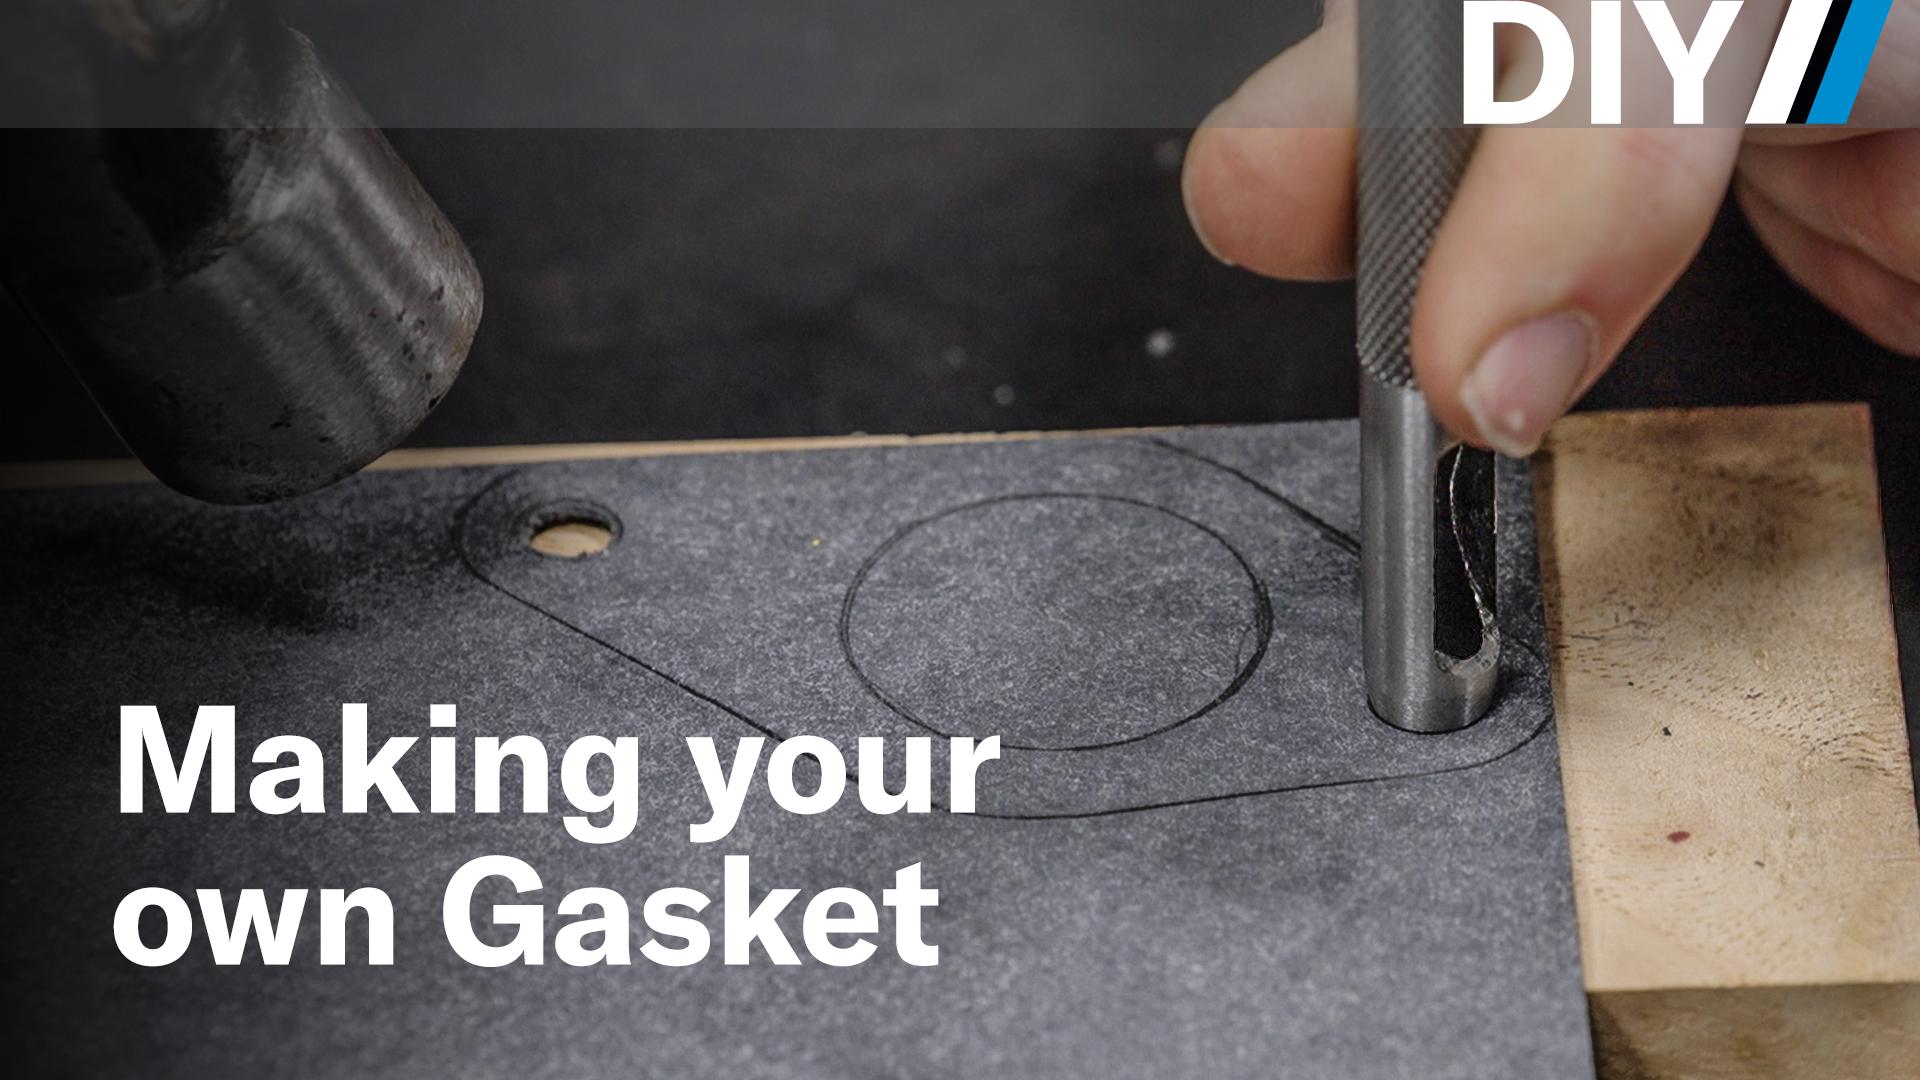 Hagerty DIY Making a Gasket